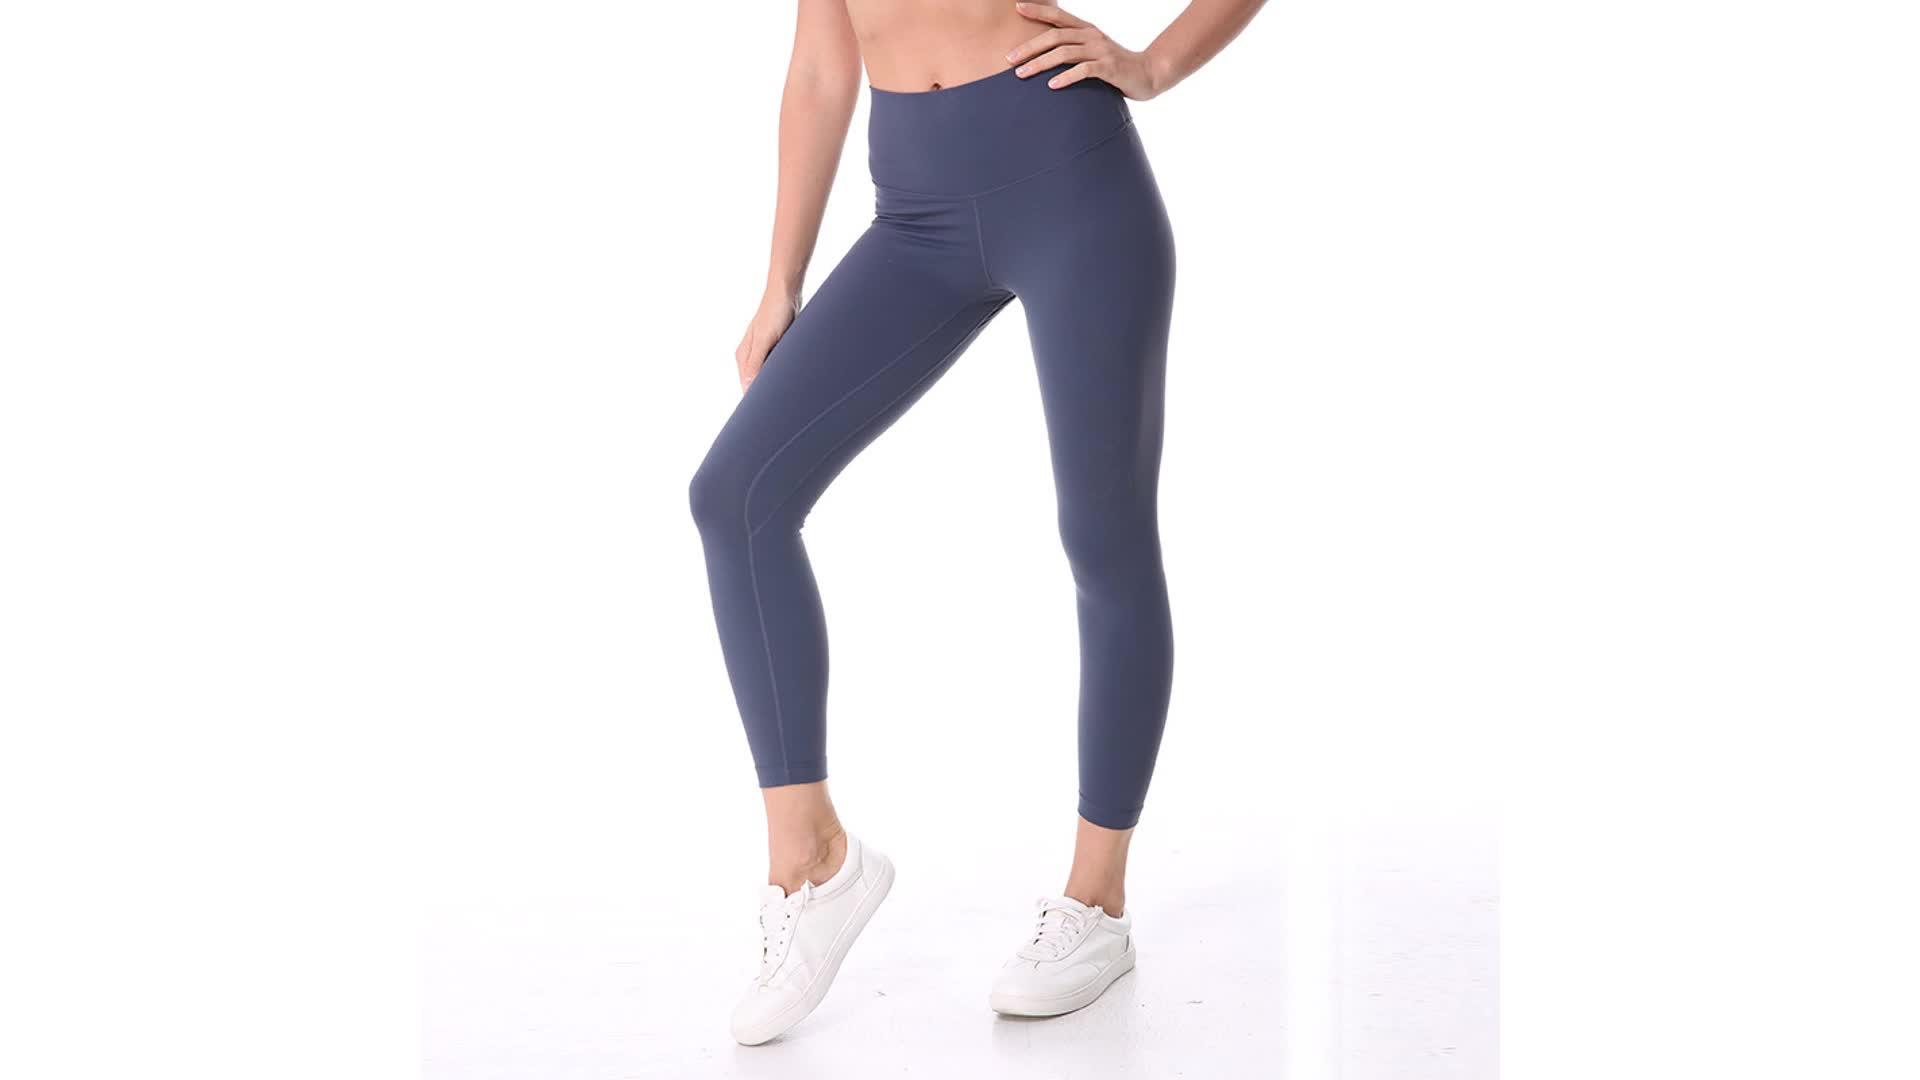 Heißer verkauf 2 teile / satz frauen yoga sets fitness nahtlose sport bh yoga hosen legging gym training joggen